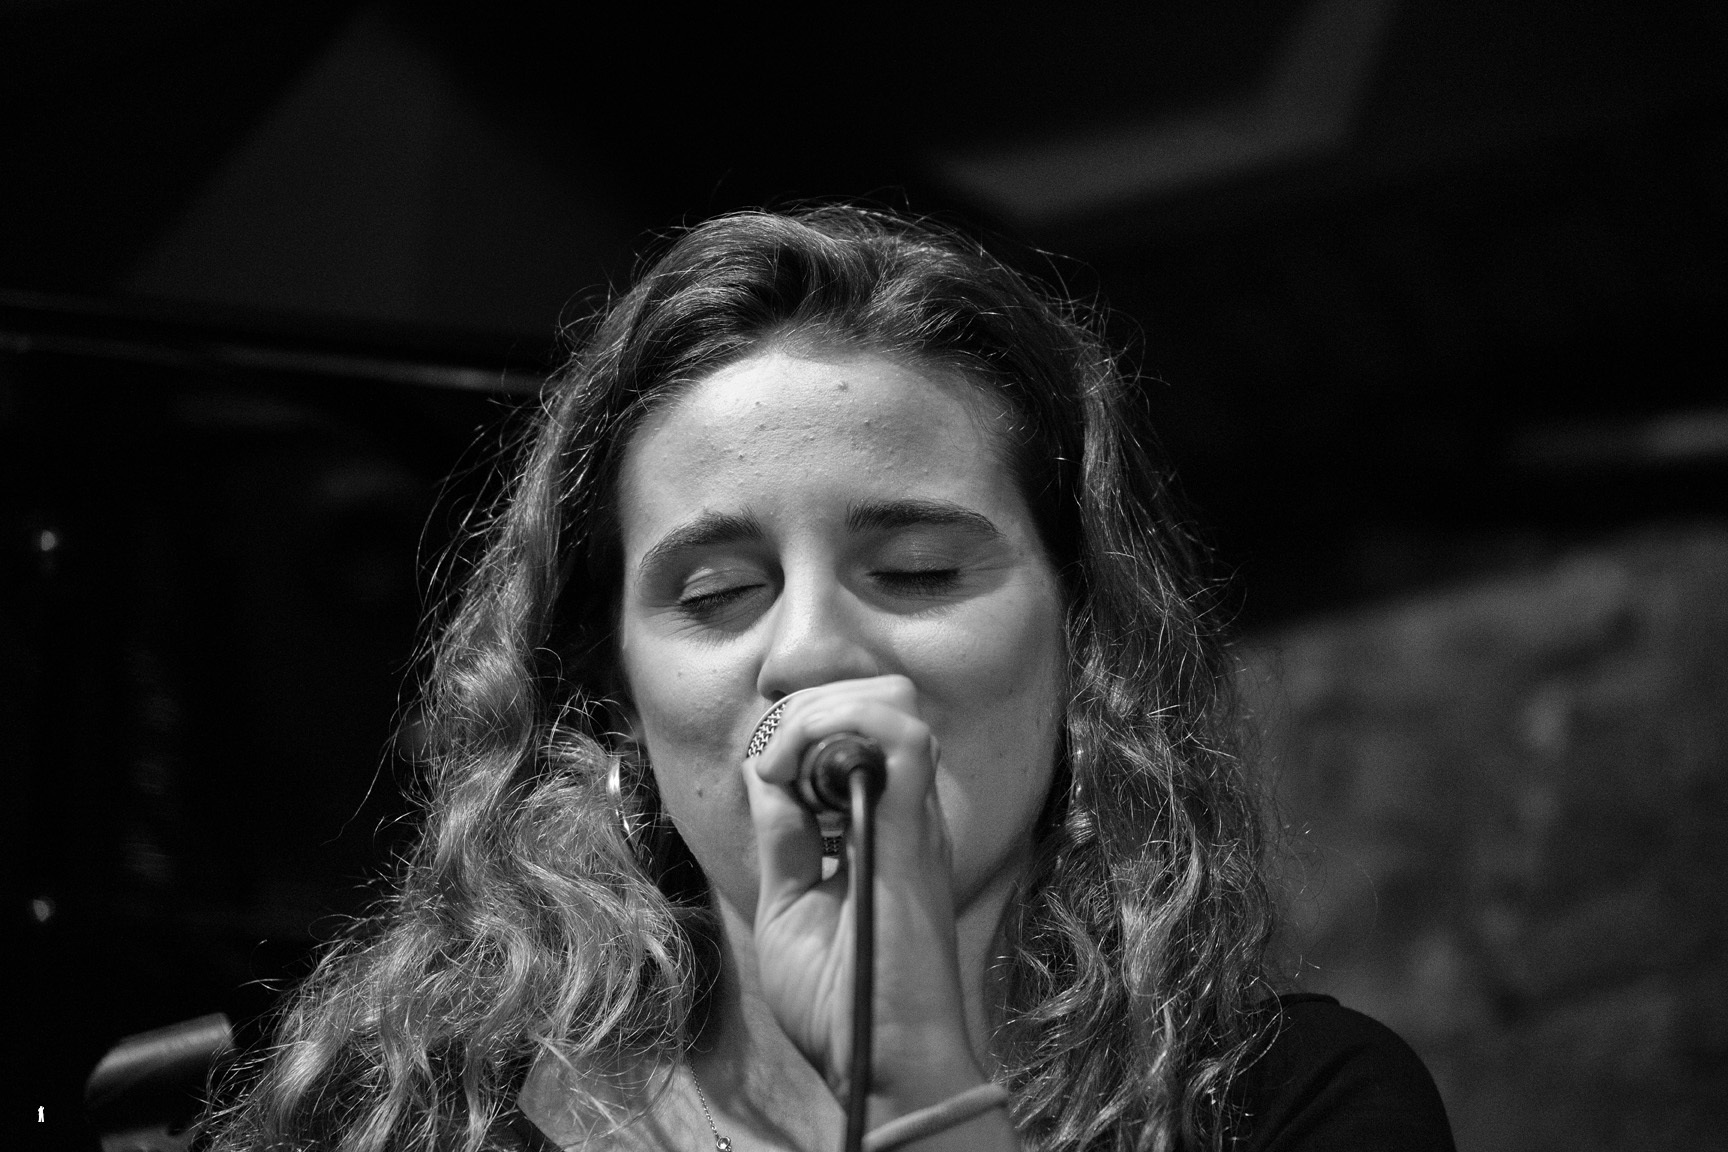 Marina Tuset